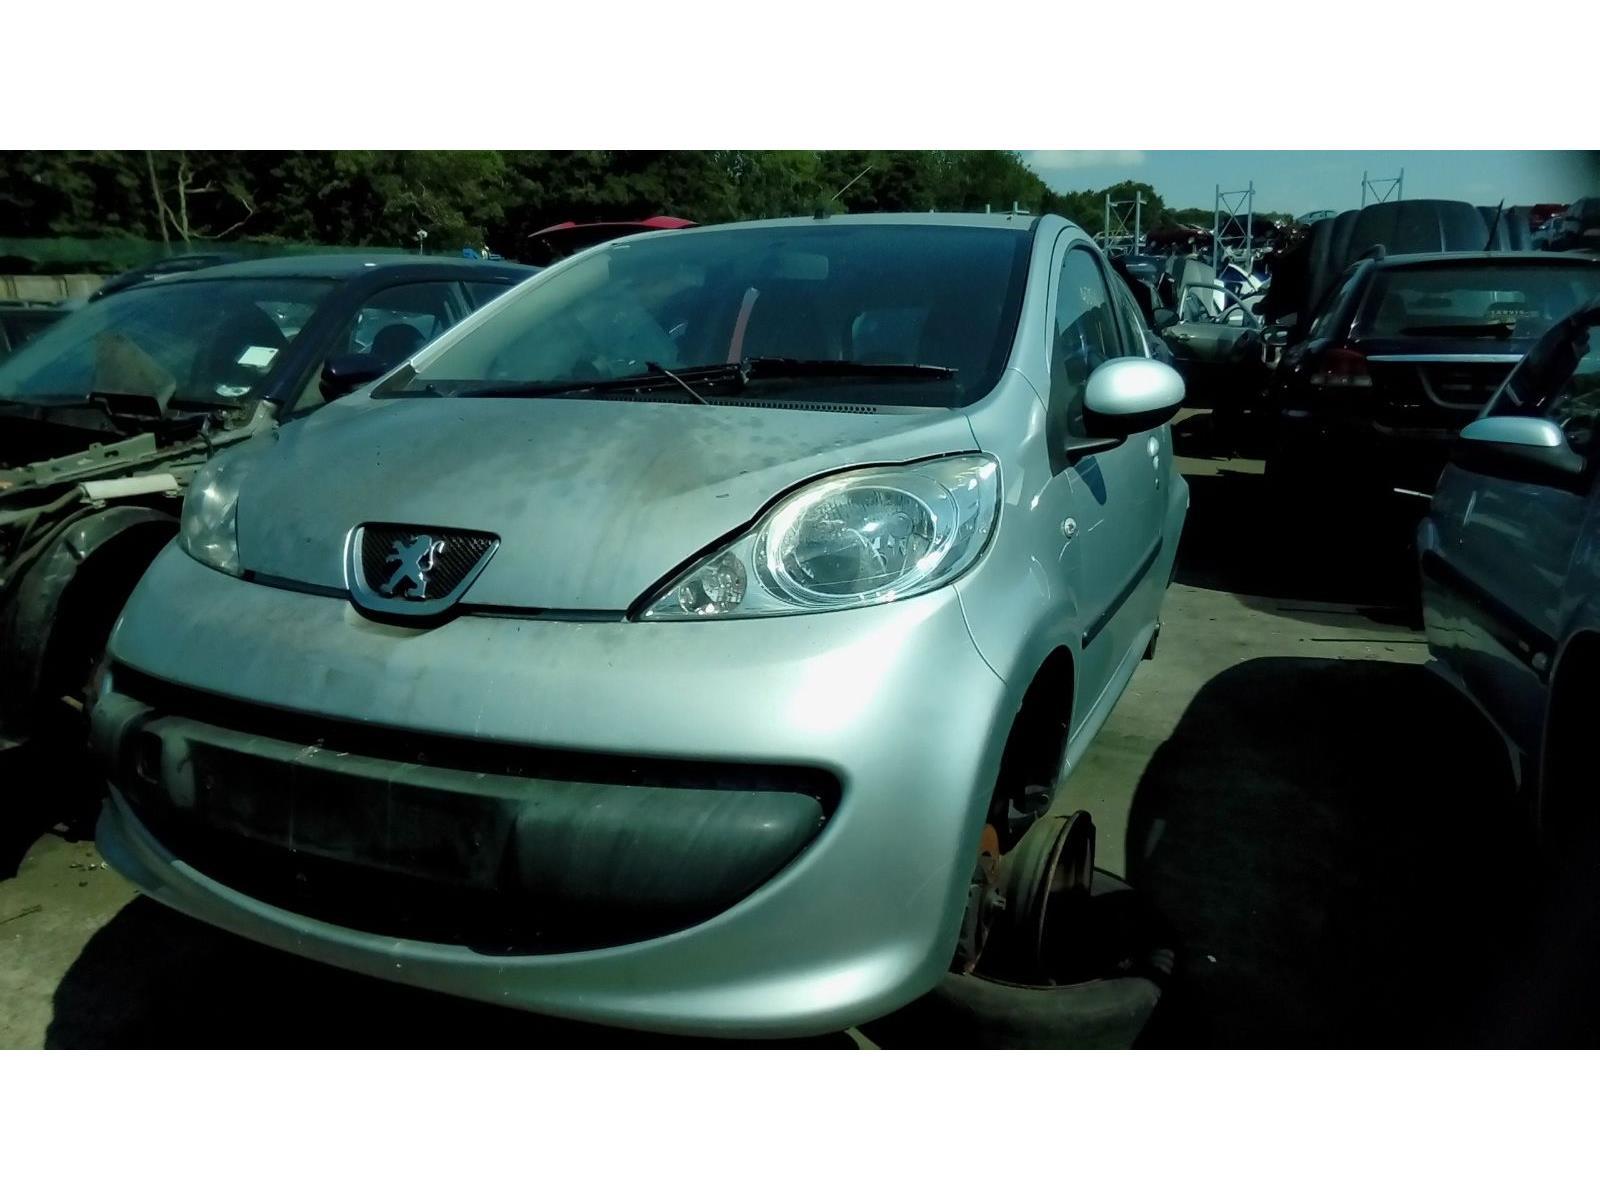 Peugeot 107 2005 To 2008 Urban 3 Door Hatchback Scrap Salvage Fuse Box On Year